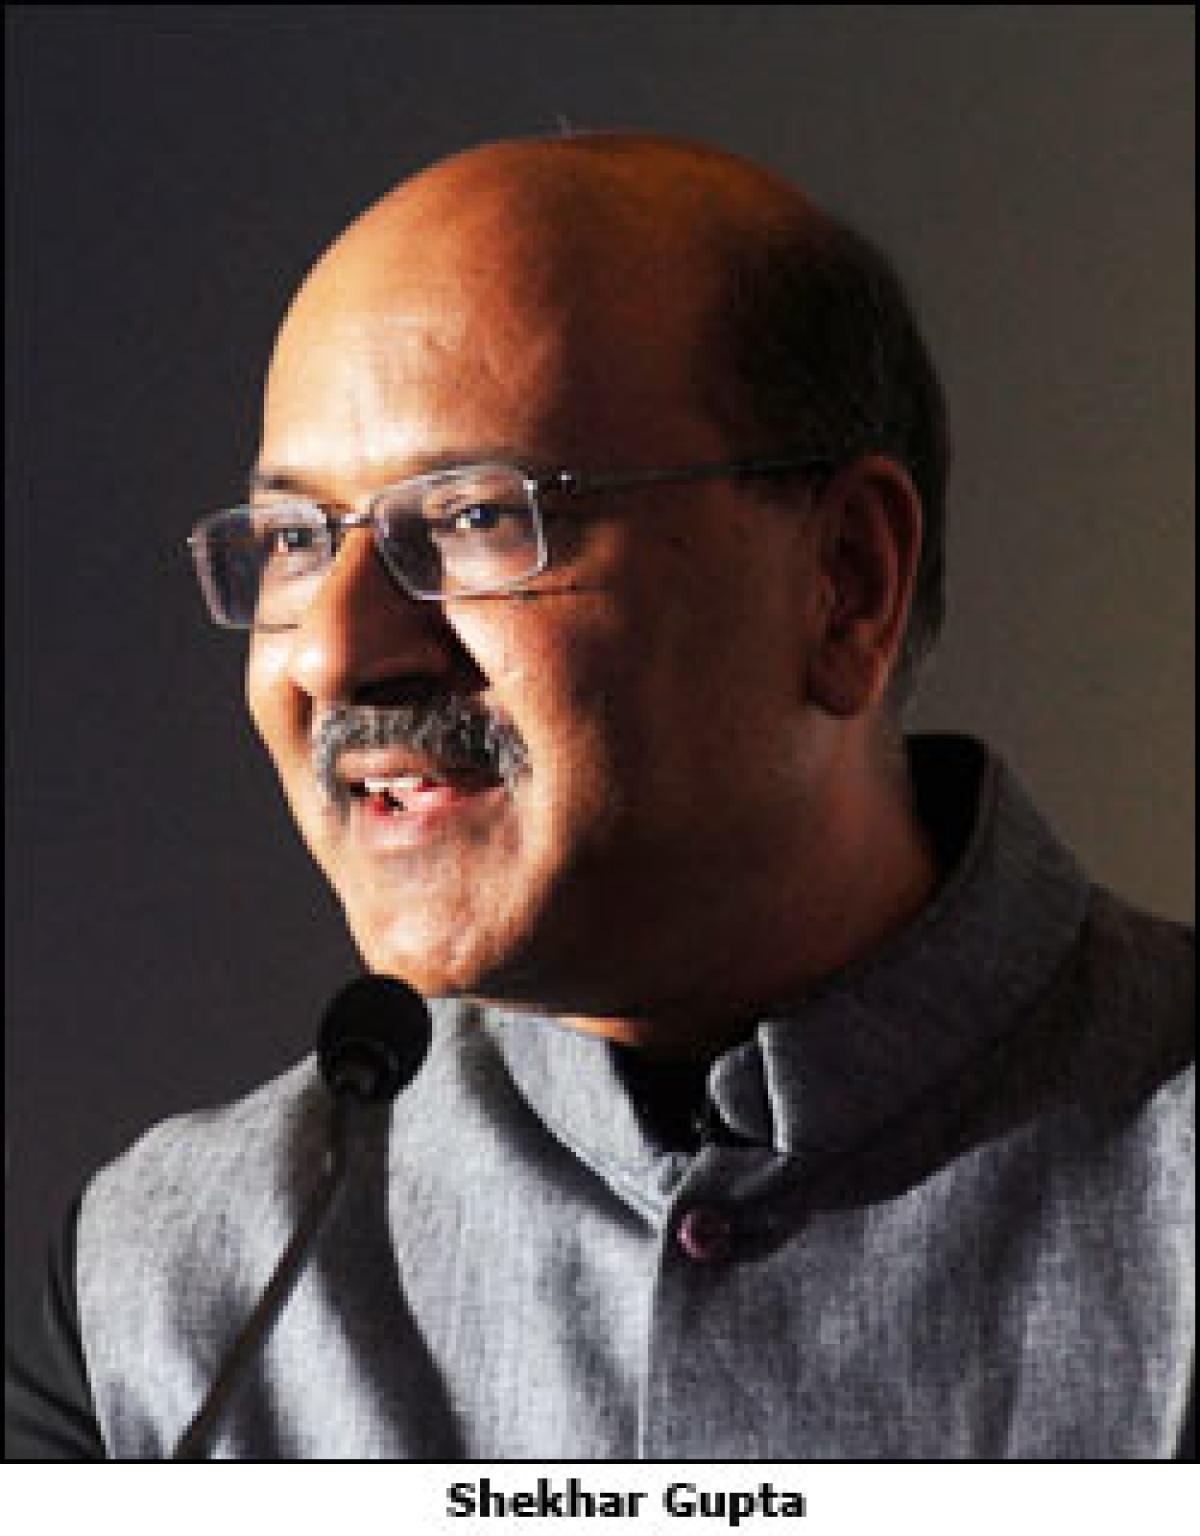 TV.NXT 2012: We don't need regulators, we need good editors: Shekhar Gupta